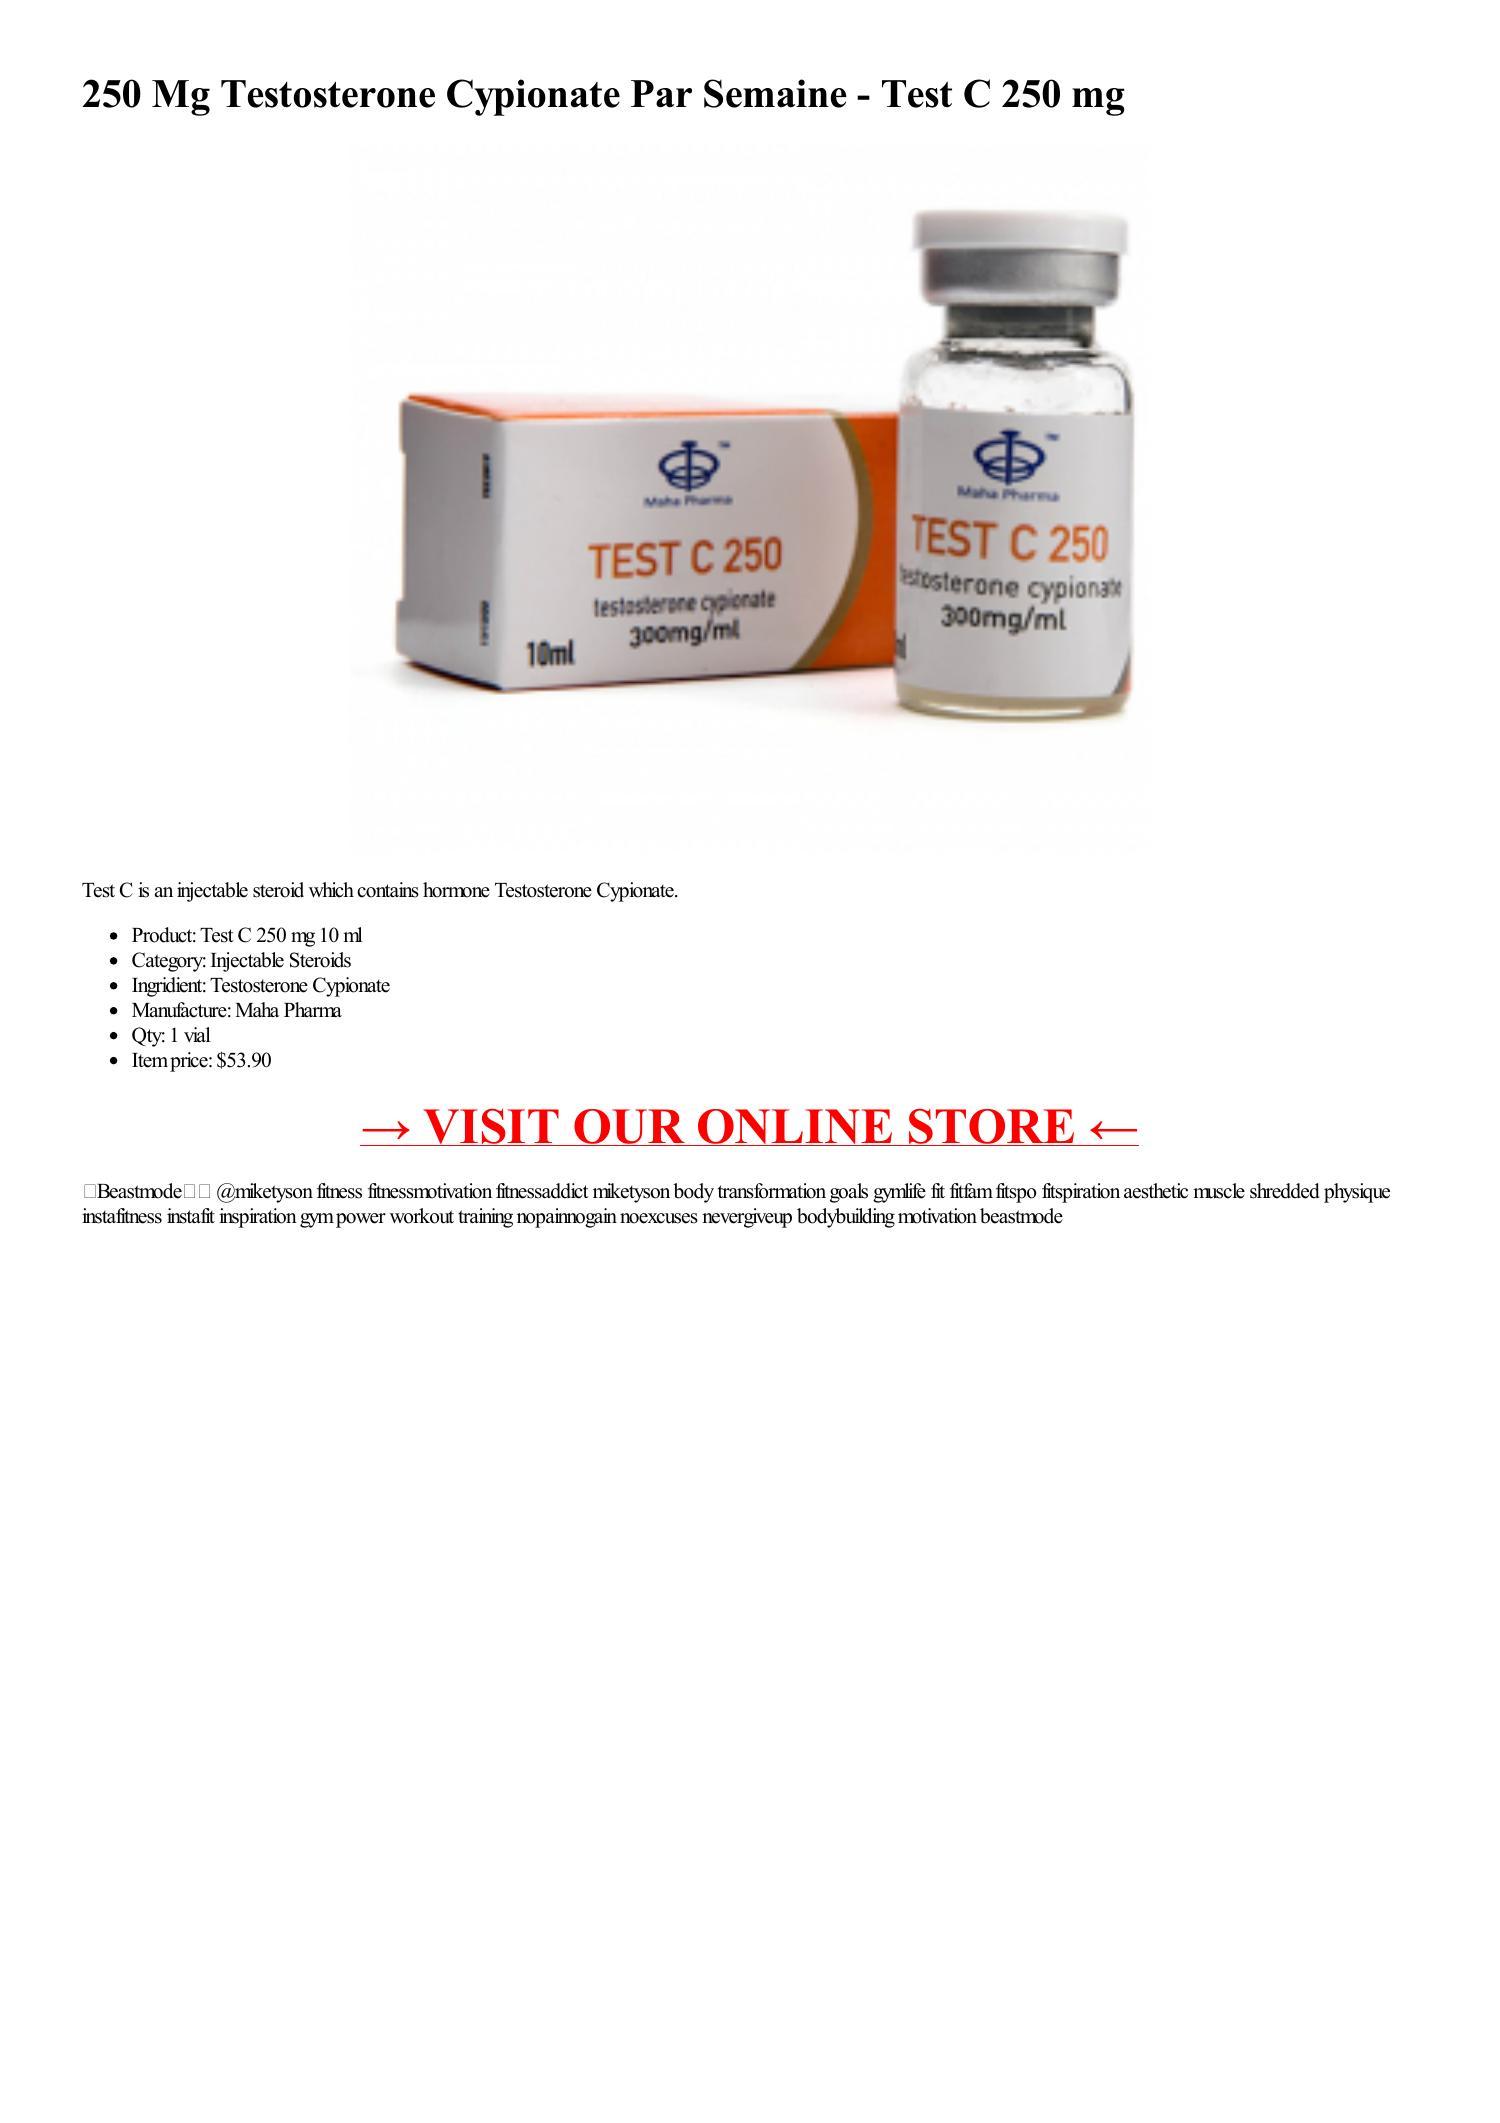 250 Mg Testosterone Cypionate Par Semaine - Test C 250 mg 1 vial 10 ml-html.pdf DocDroid